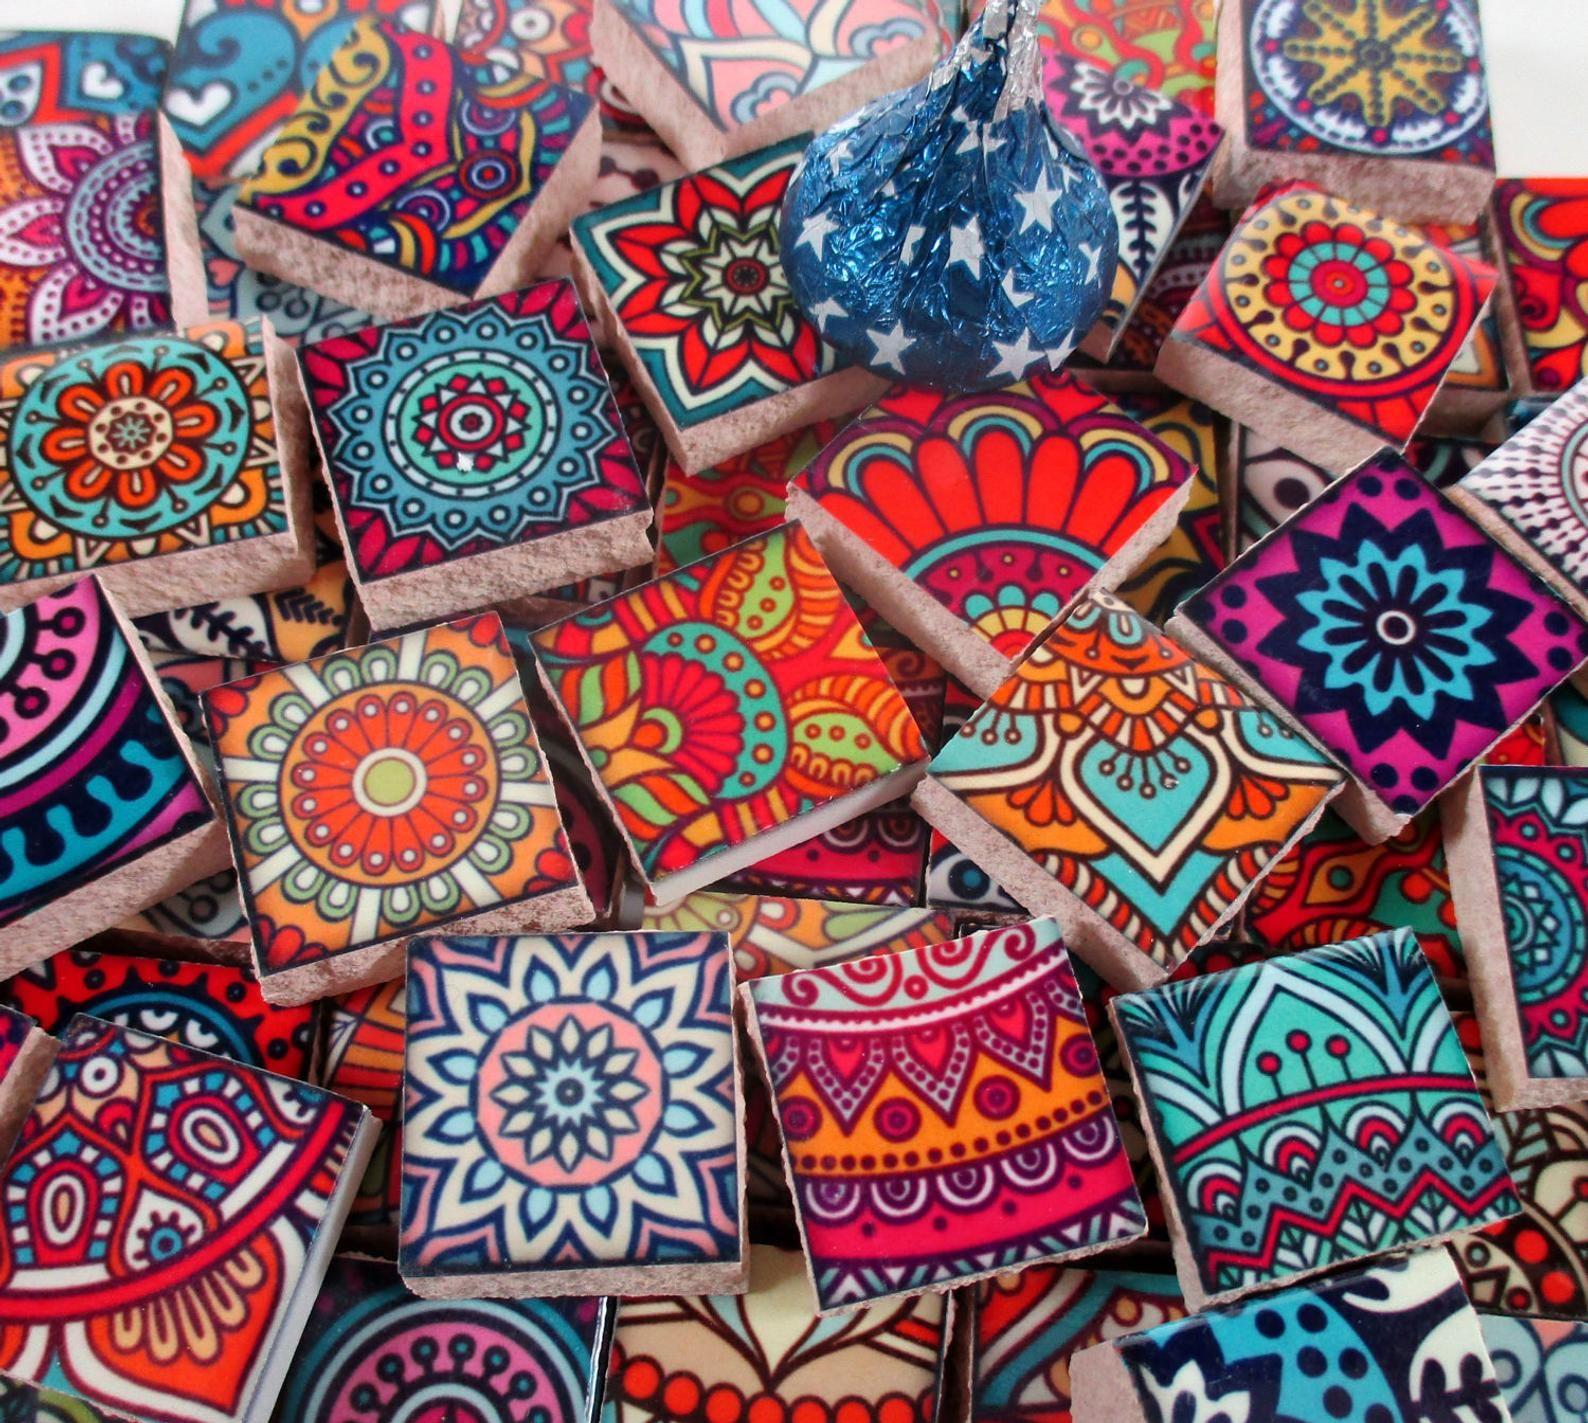 Mosaico In Ceramica Piastrelle Piastrelle Marocchine Boho Etsy Boho Tiles Ceramic Mosaic Tile Mosaic Art